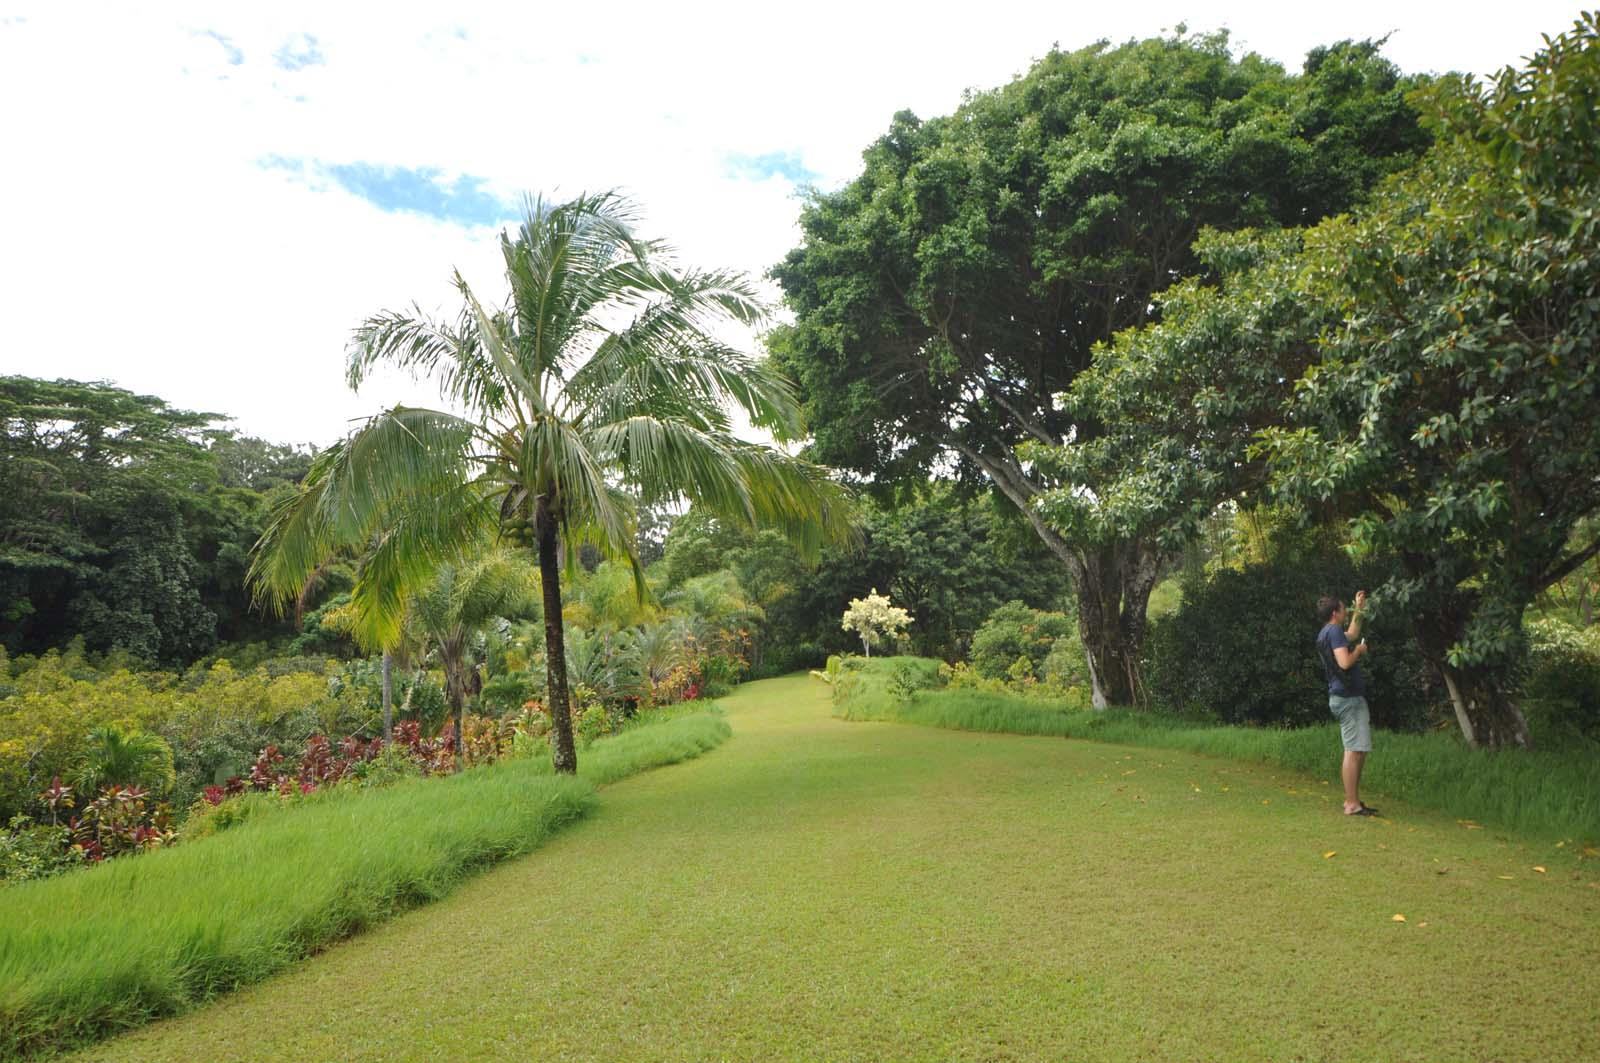 106_maui_hawaii_island